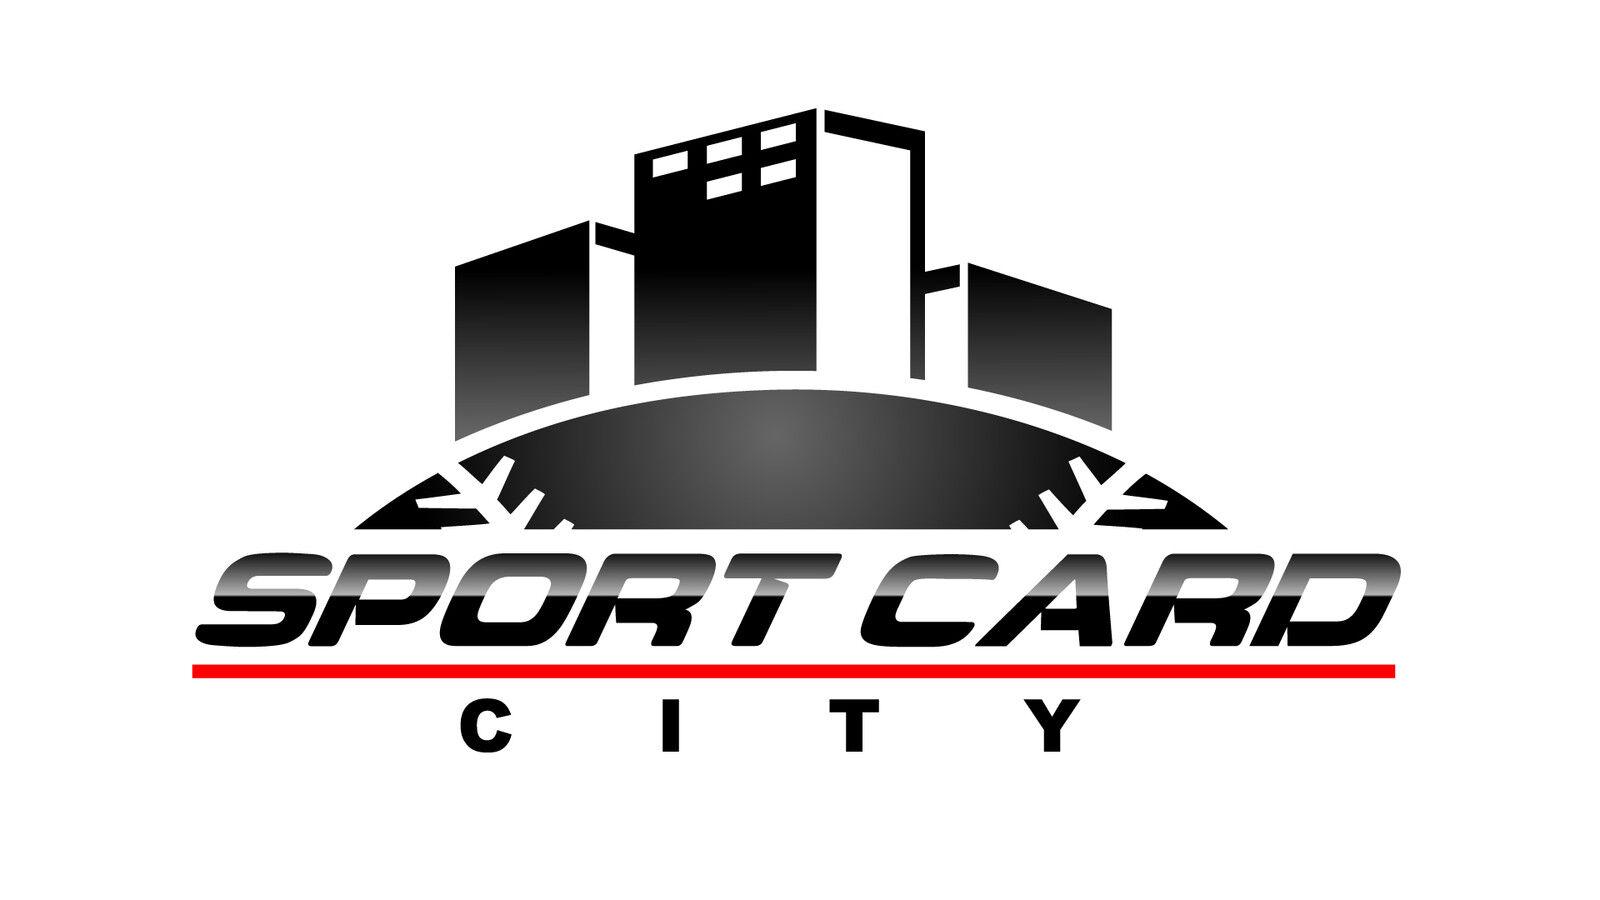 SportCardCity